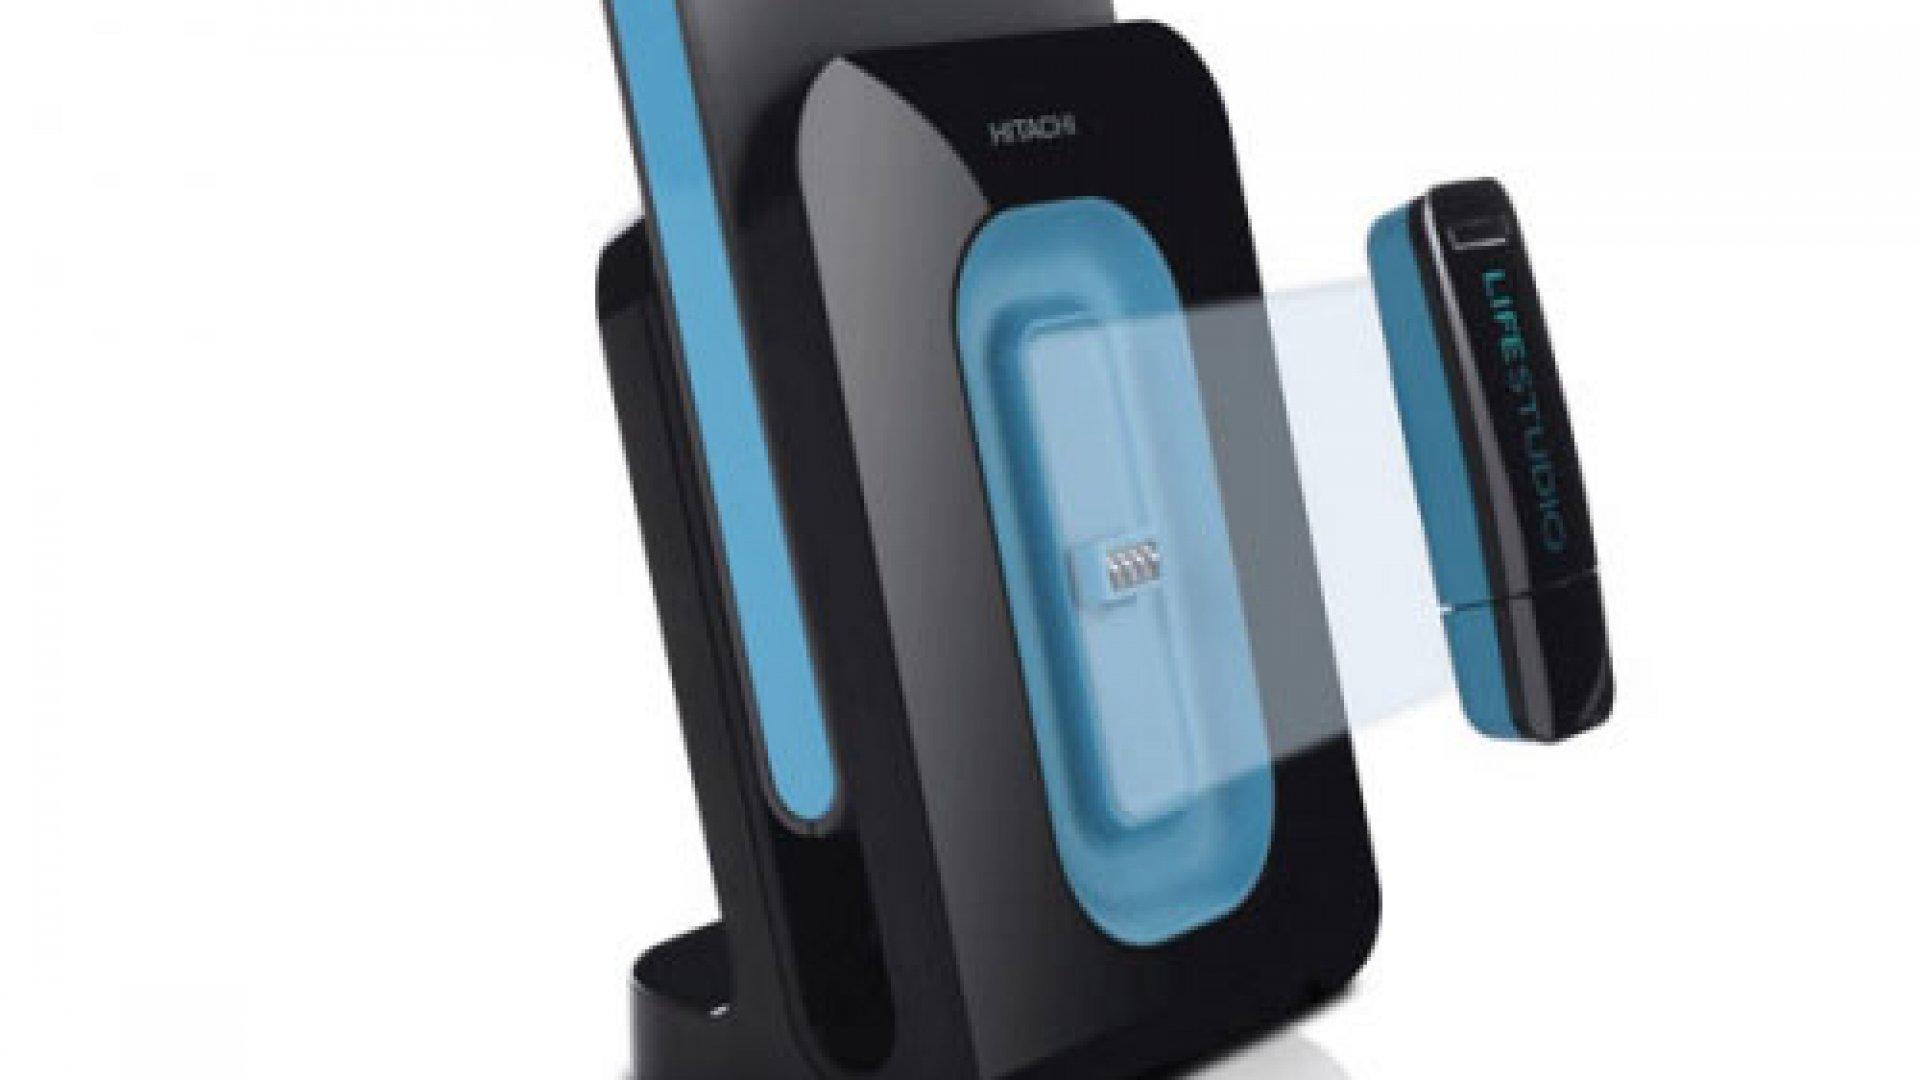 Best Portable Hard Drive: Hitachi LifeStudio MobilePlus